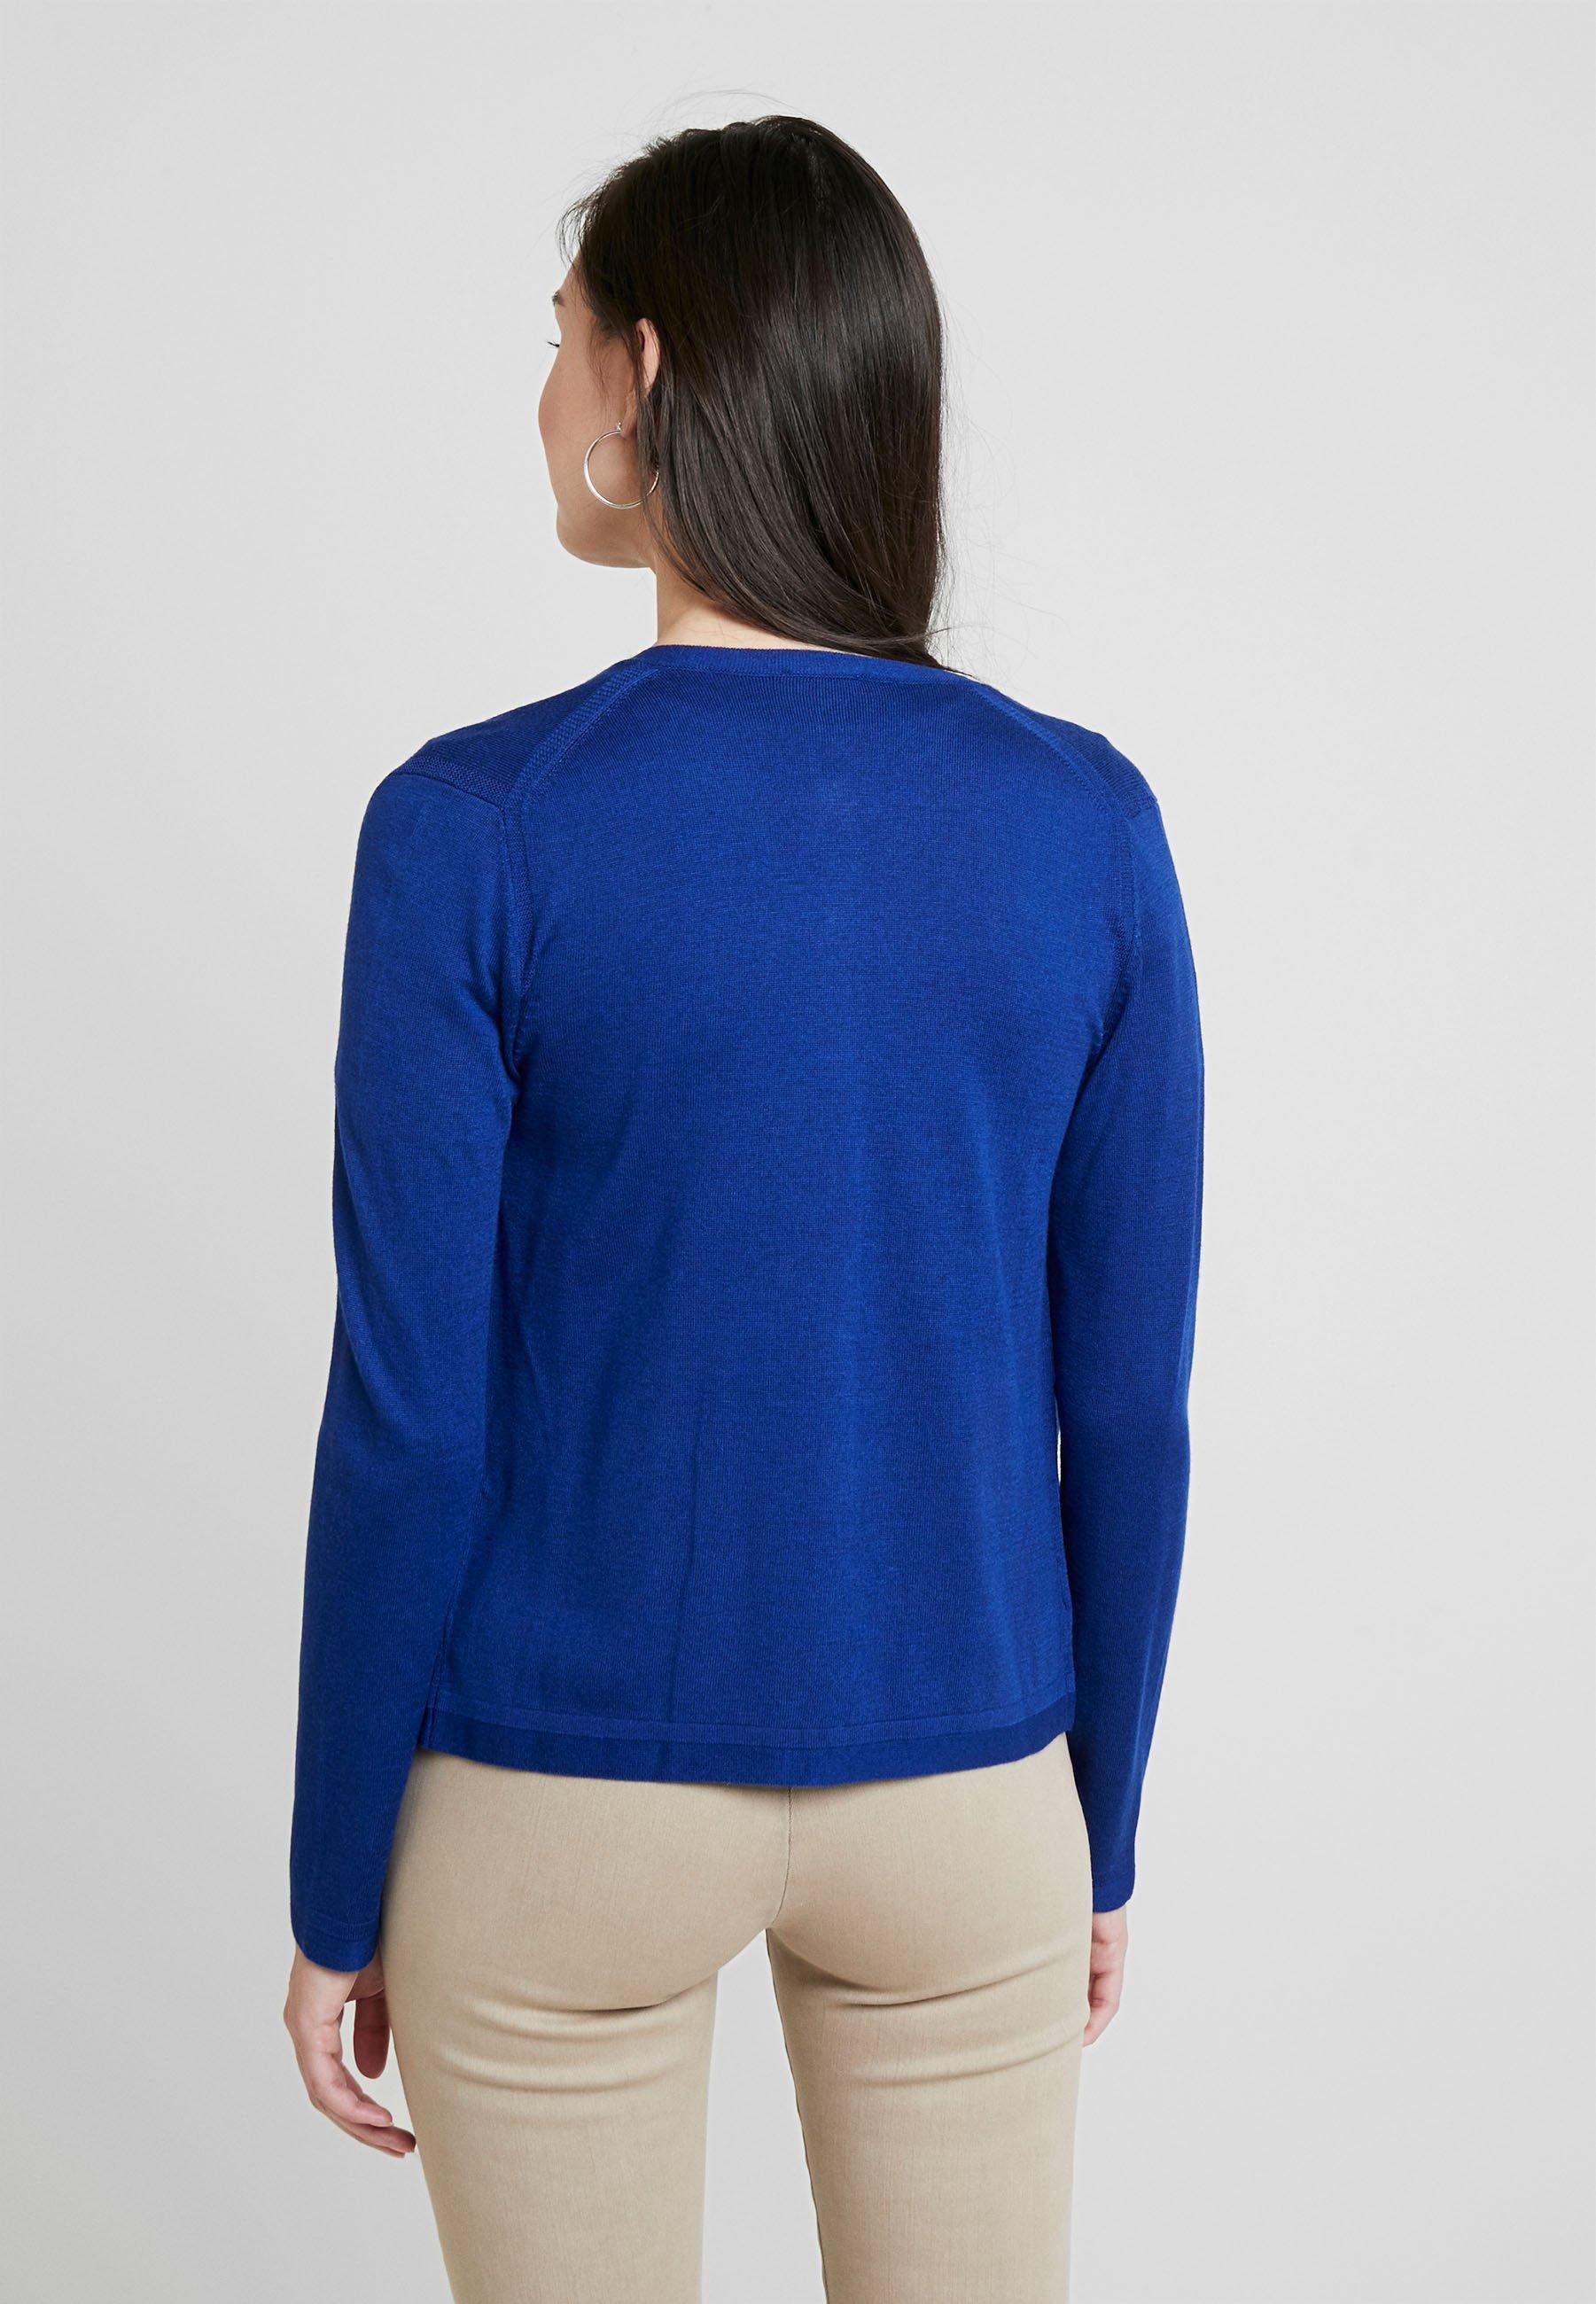 Benetton CREW NECK CARDIGAN - Gilet royal blue